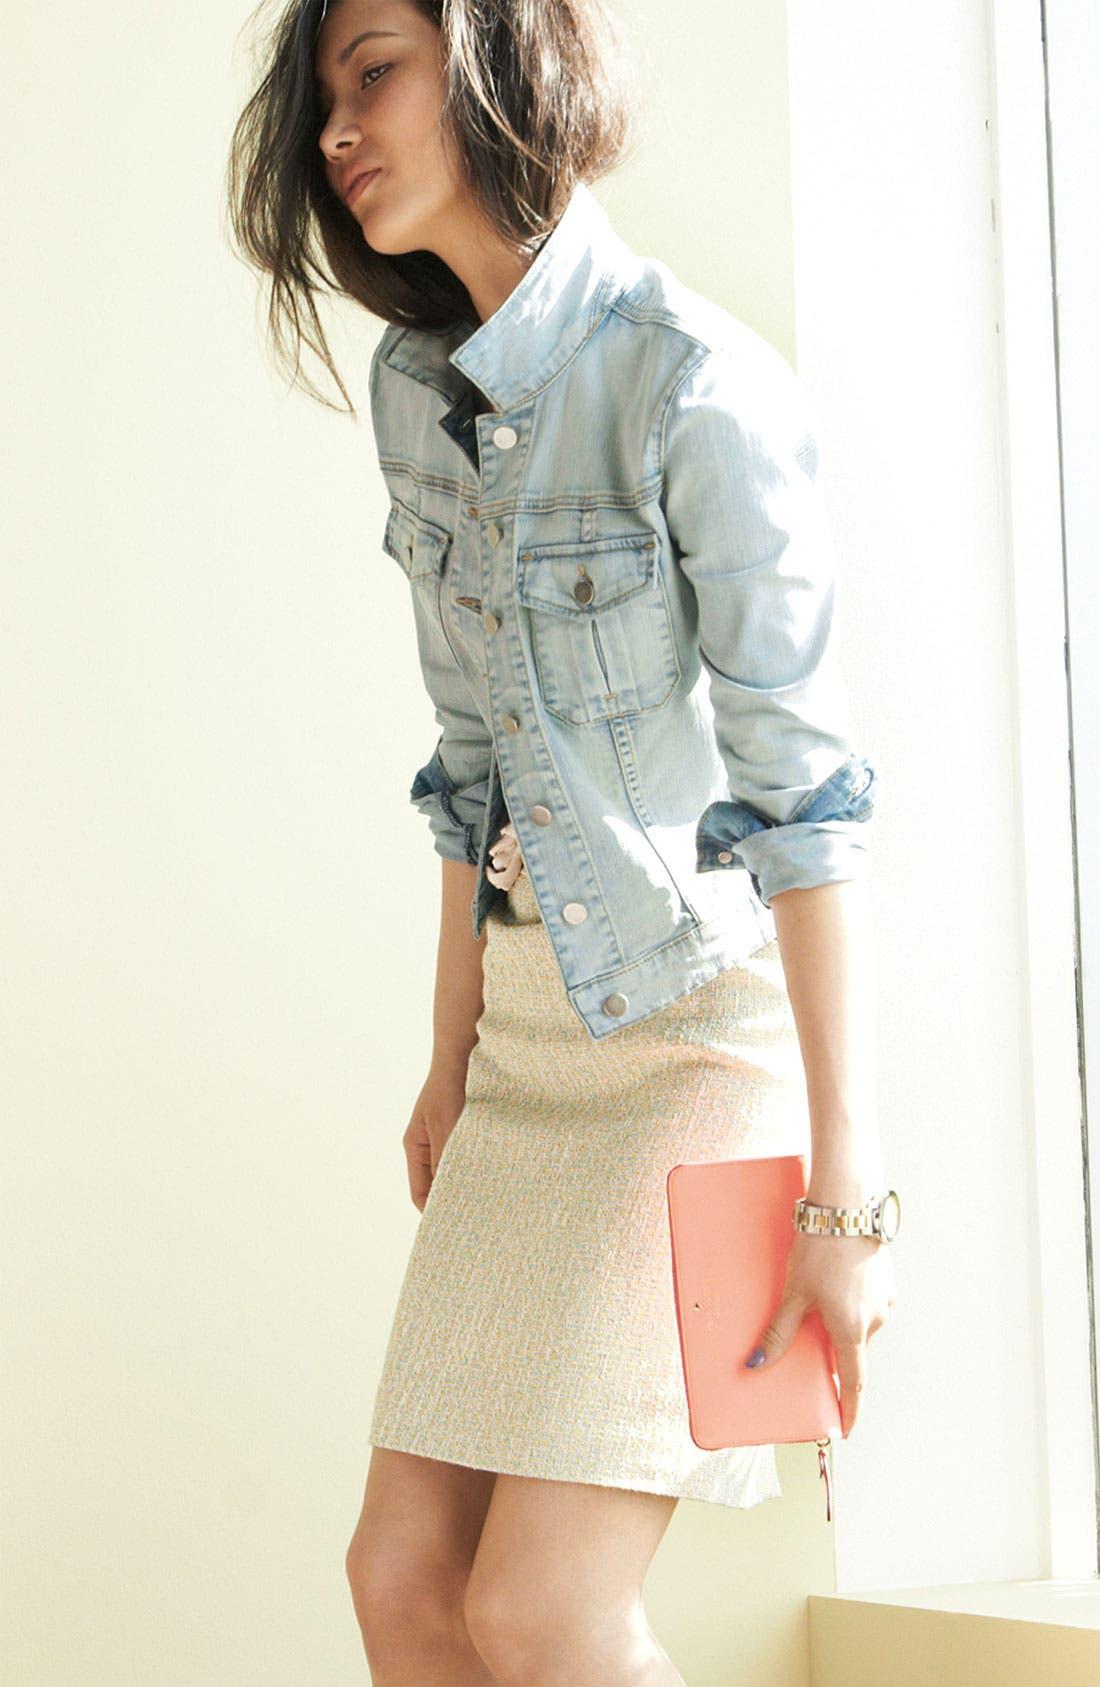 Main Image - KUT from the Kloth Denim Jacket & Halogen Tweed Skirt